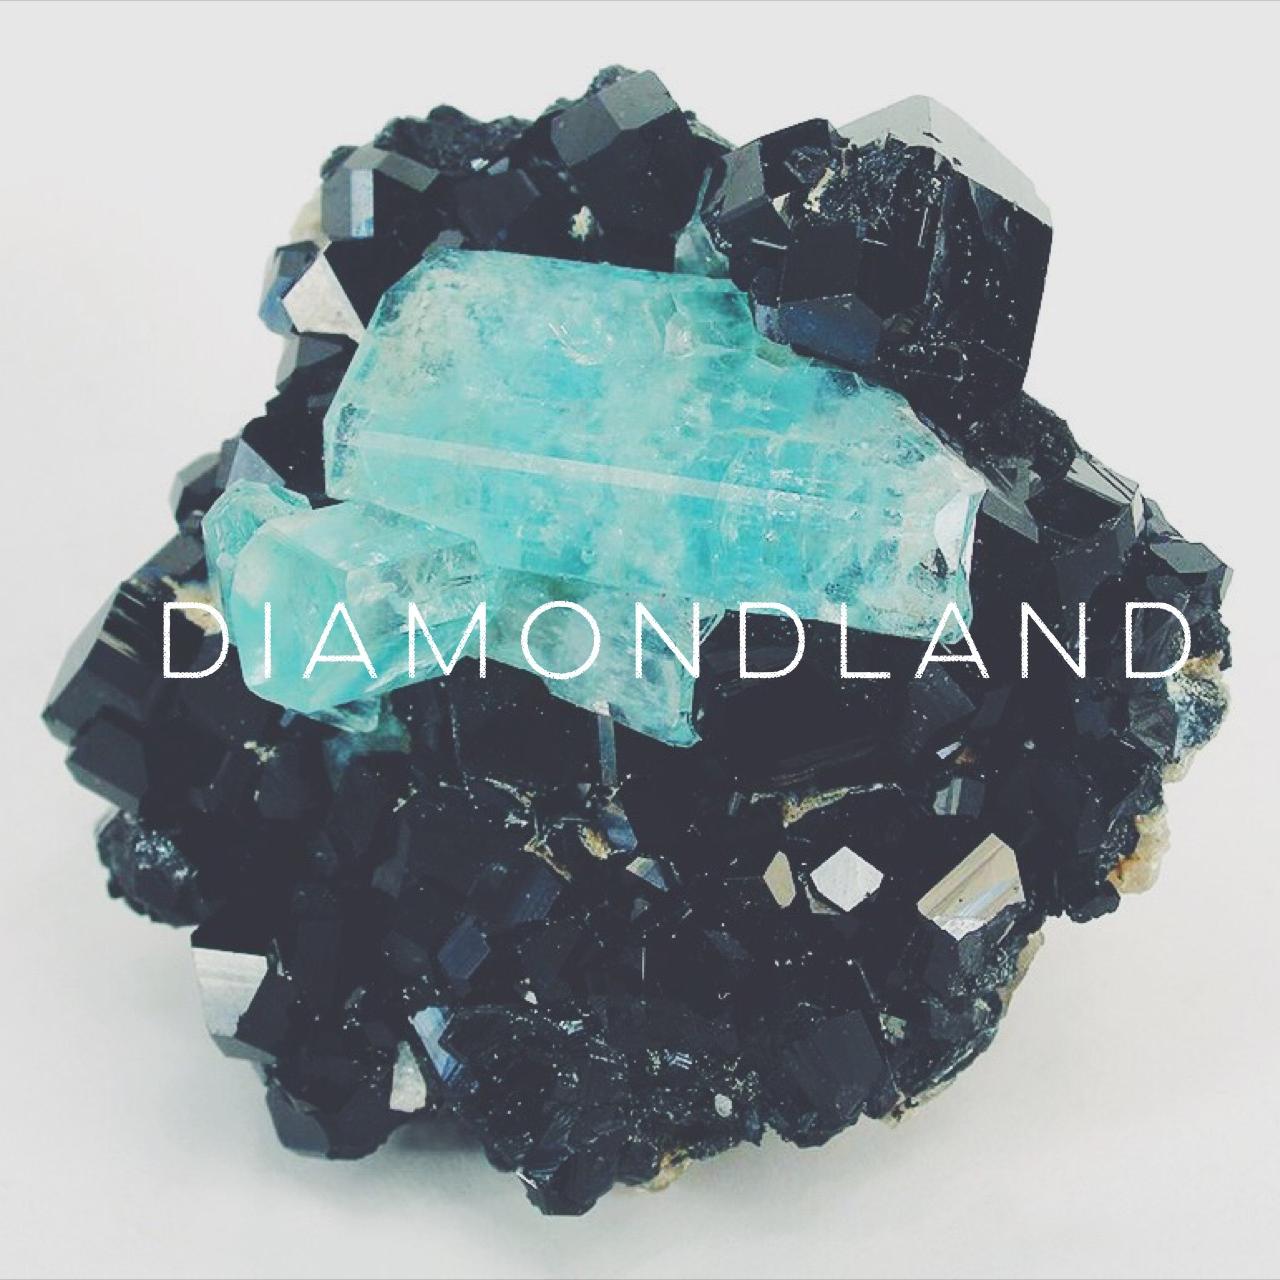 Diamondland full.JPG